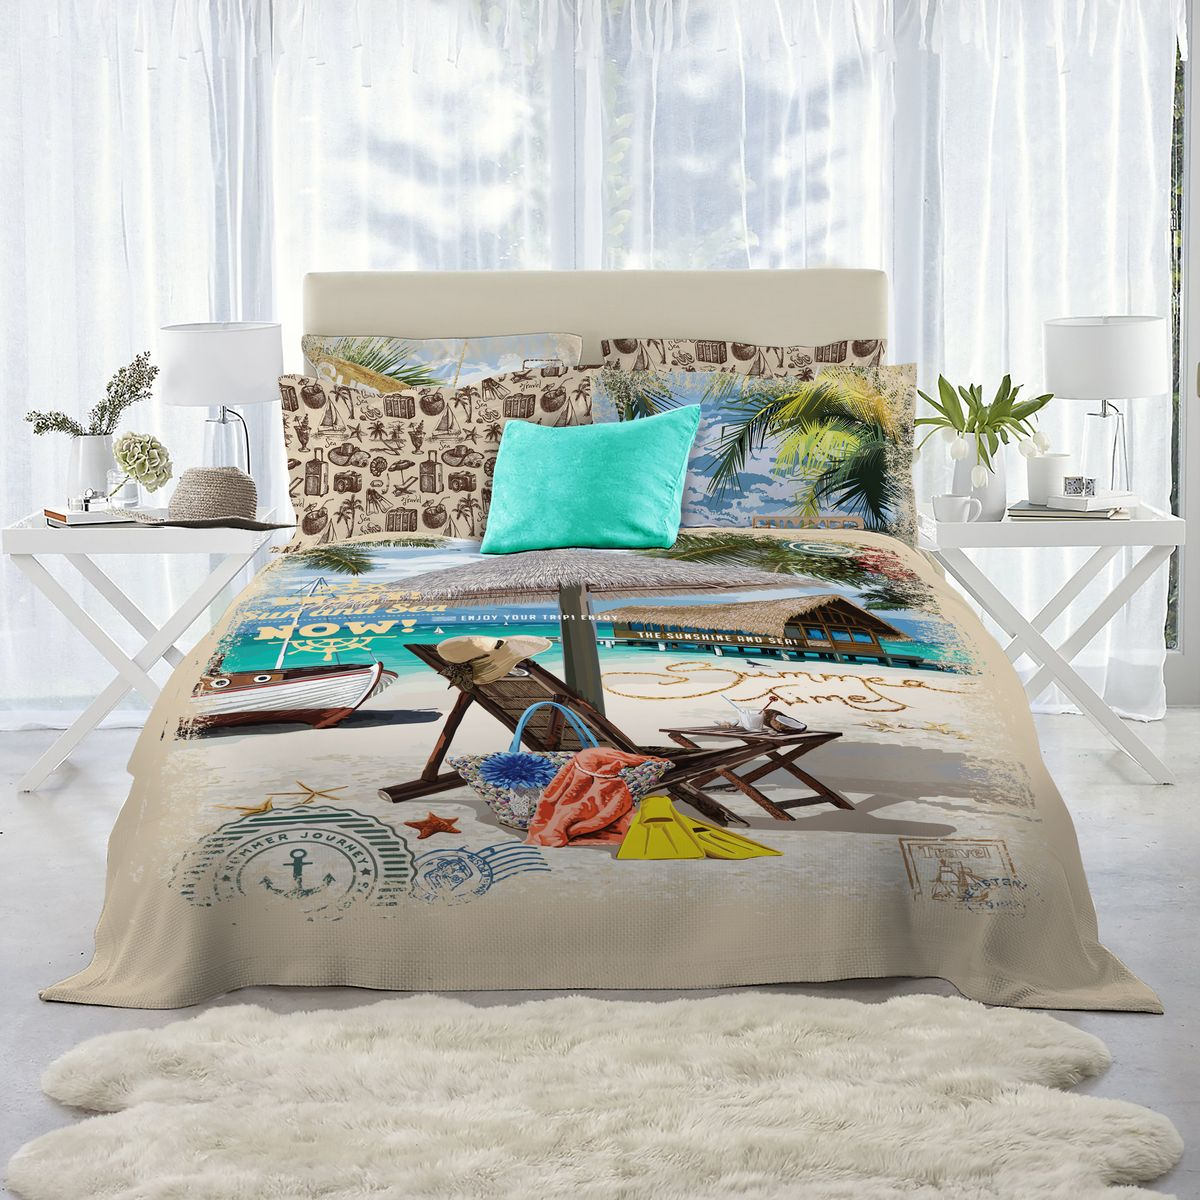 Комплект белья Mona Liza Lounger, 1,5-спальный, наволочки 50х70, 70х70 adjustable rattan sun lounger patio garden beach lounger transport by sea